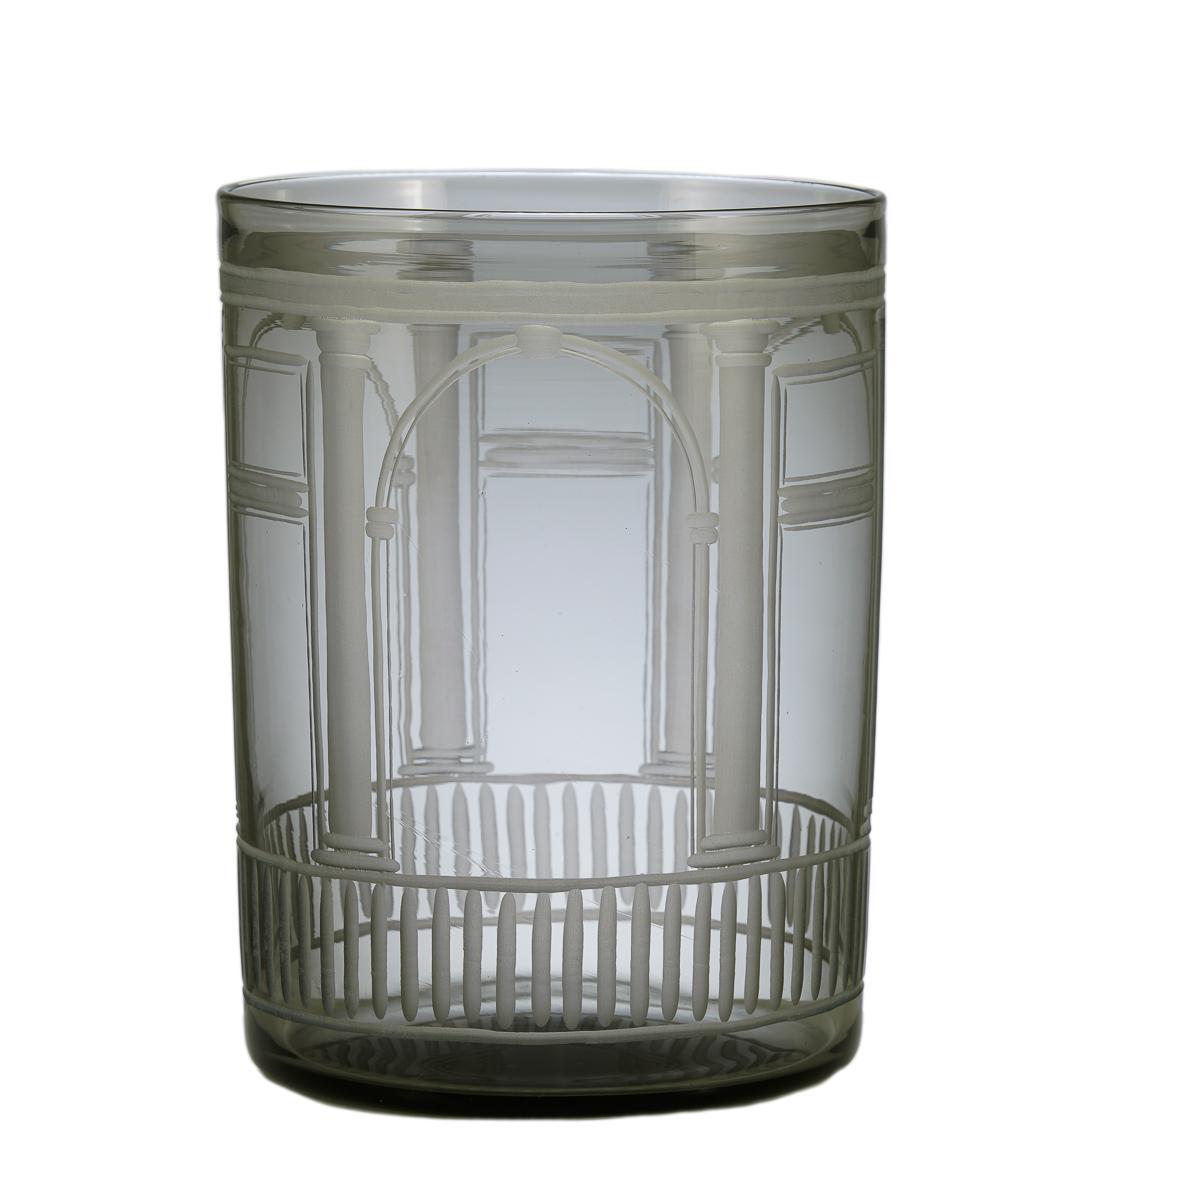 palazzo-grimani-vase-candle-crystal-grey-murano-giberto-design-precious-luxury-handmade-flower